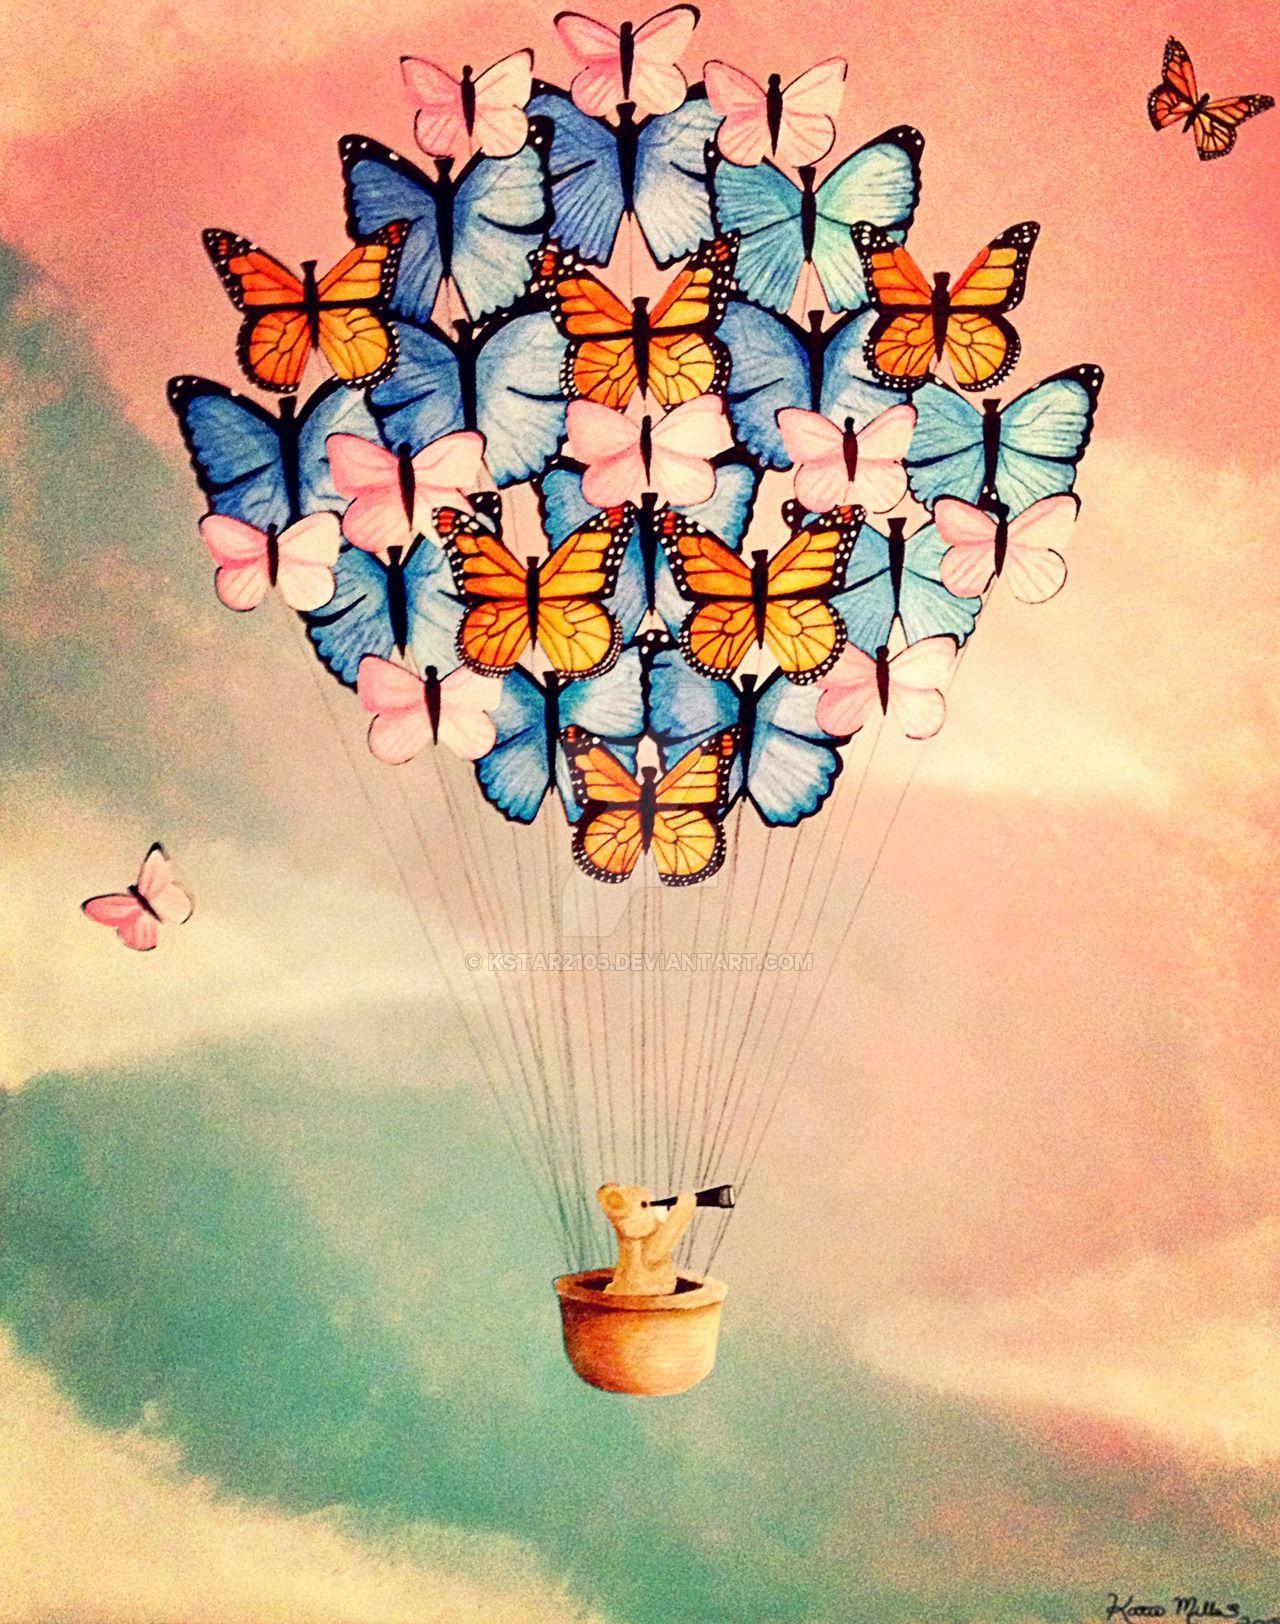 Butterfly Balloon By Kstar2105